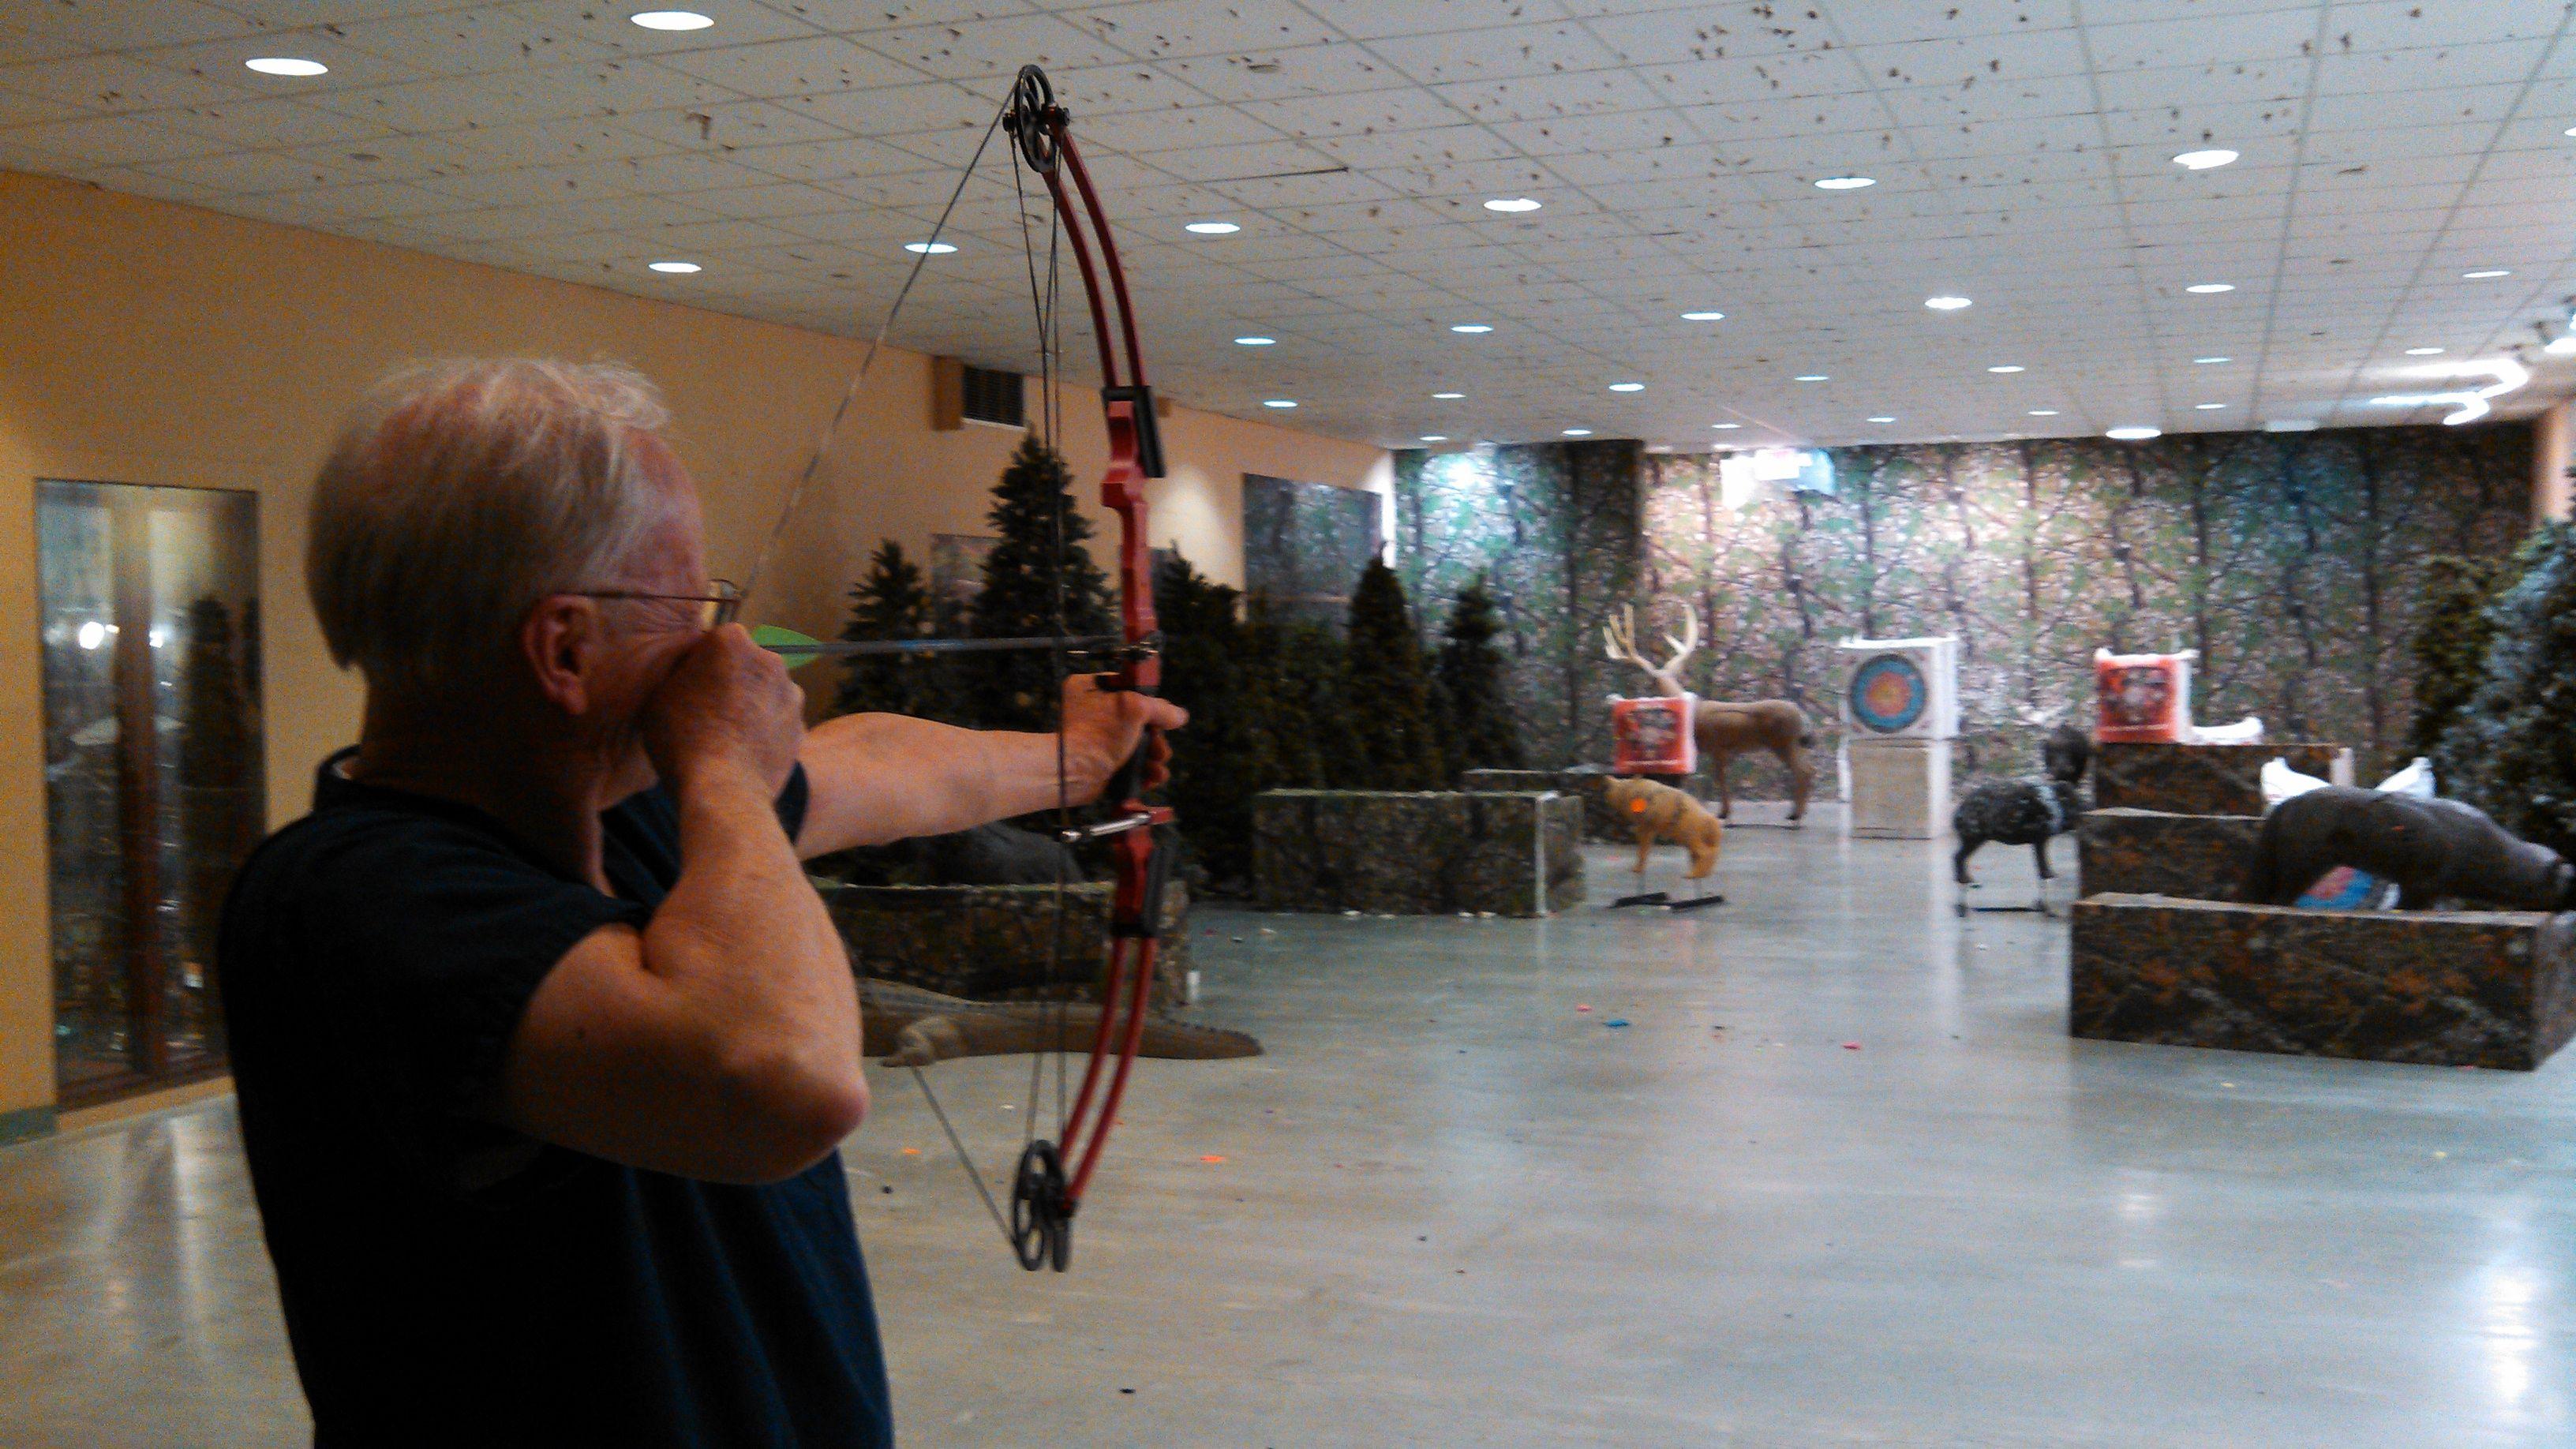 indoor home gun range - Google Search | gun range | Pinterest ...